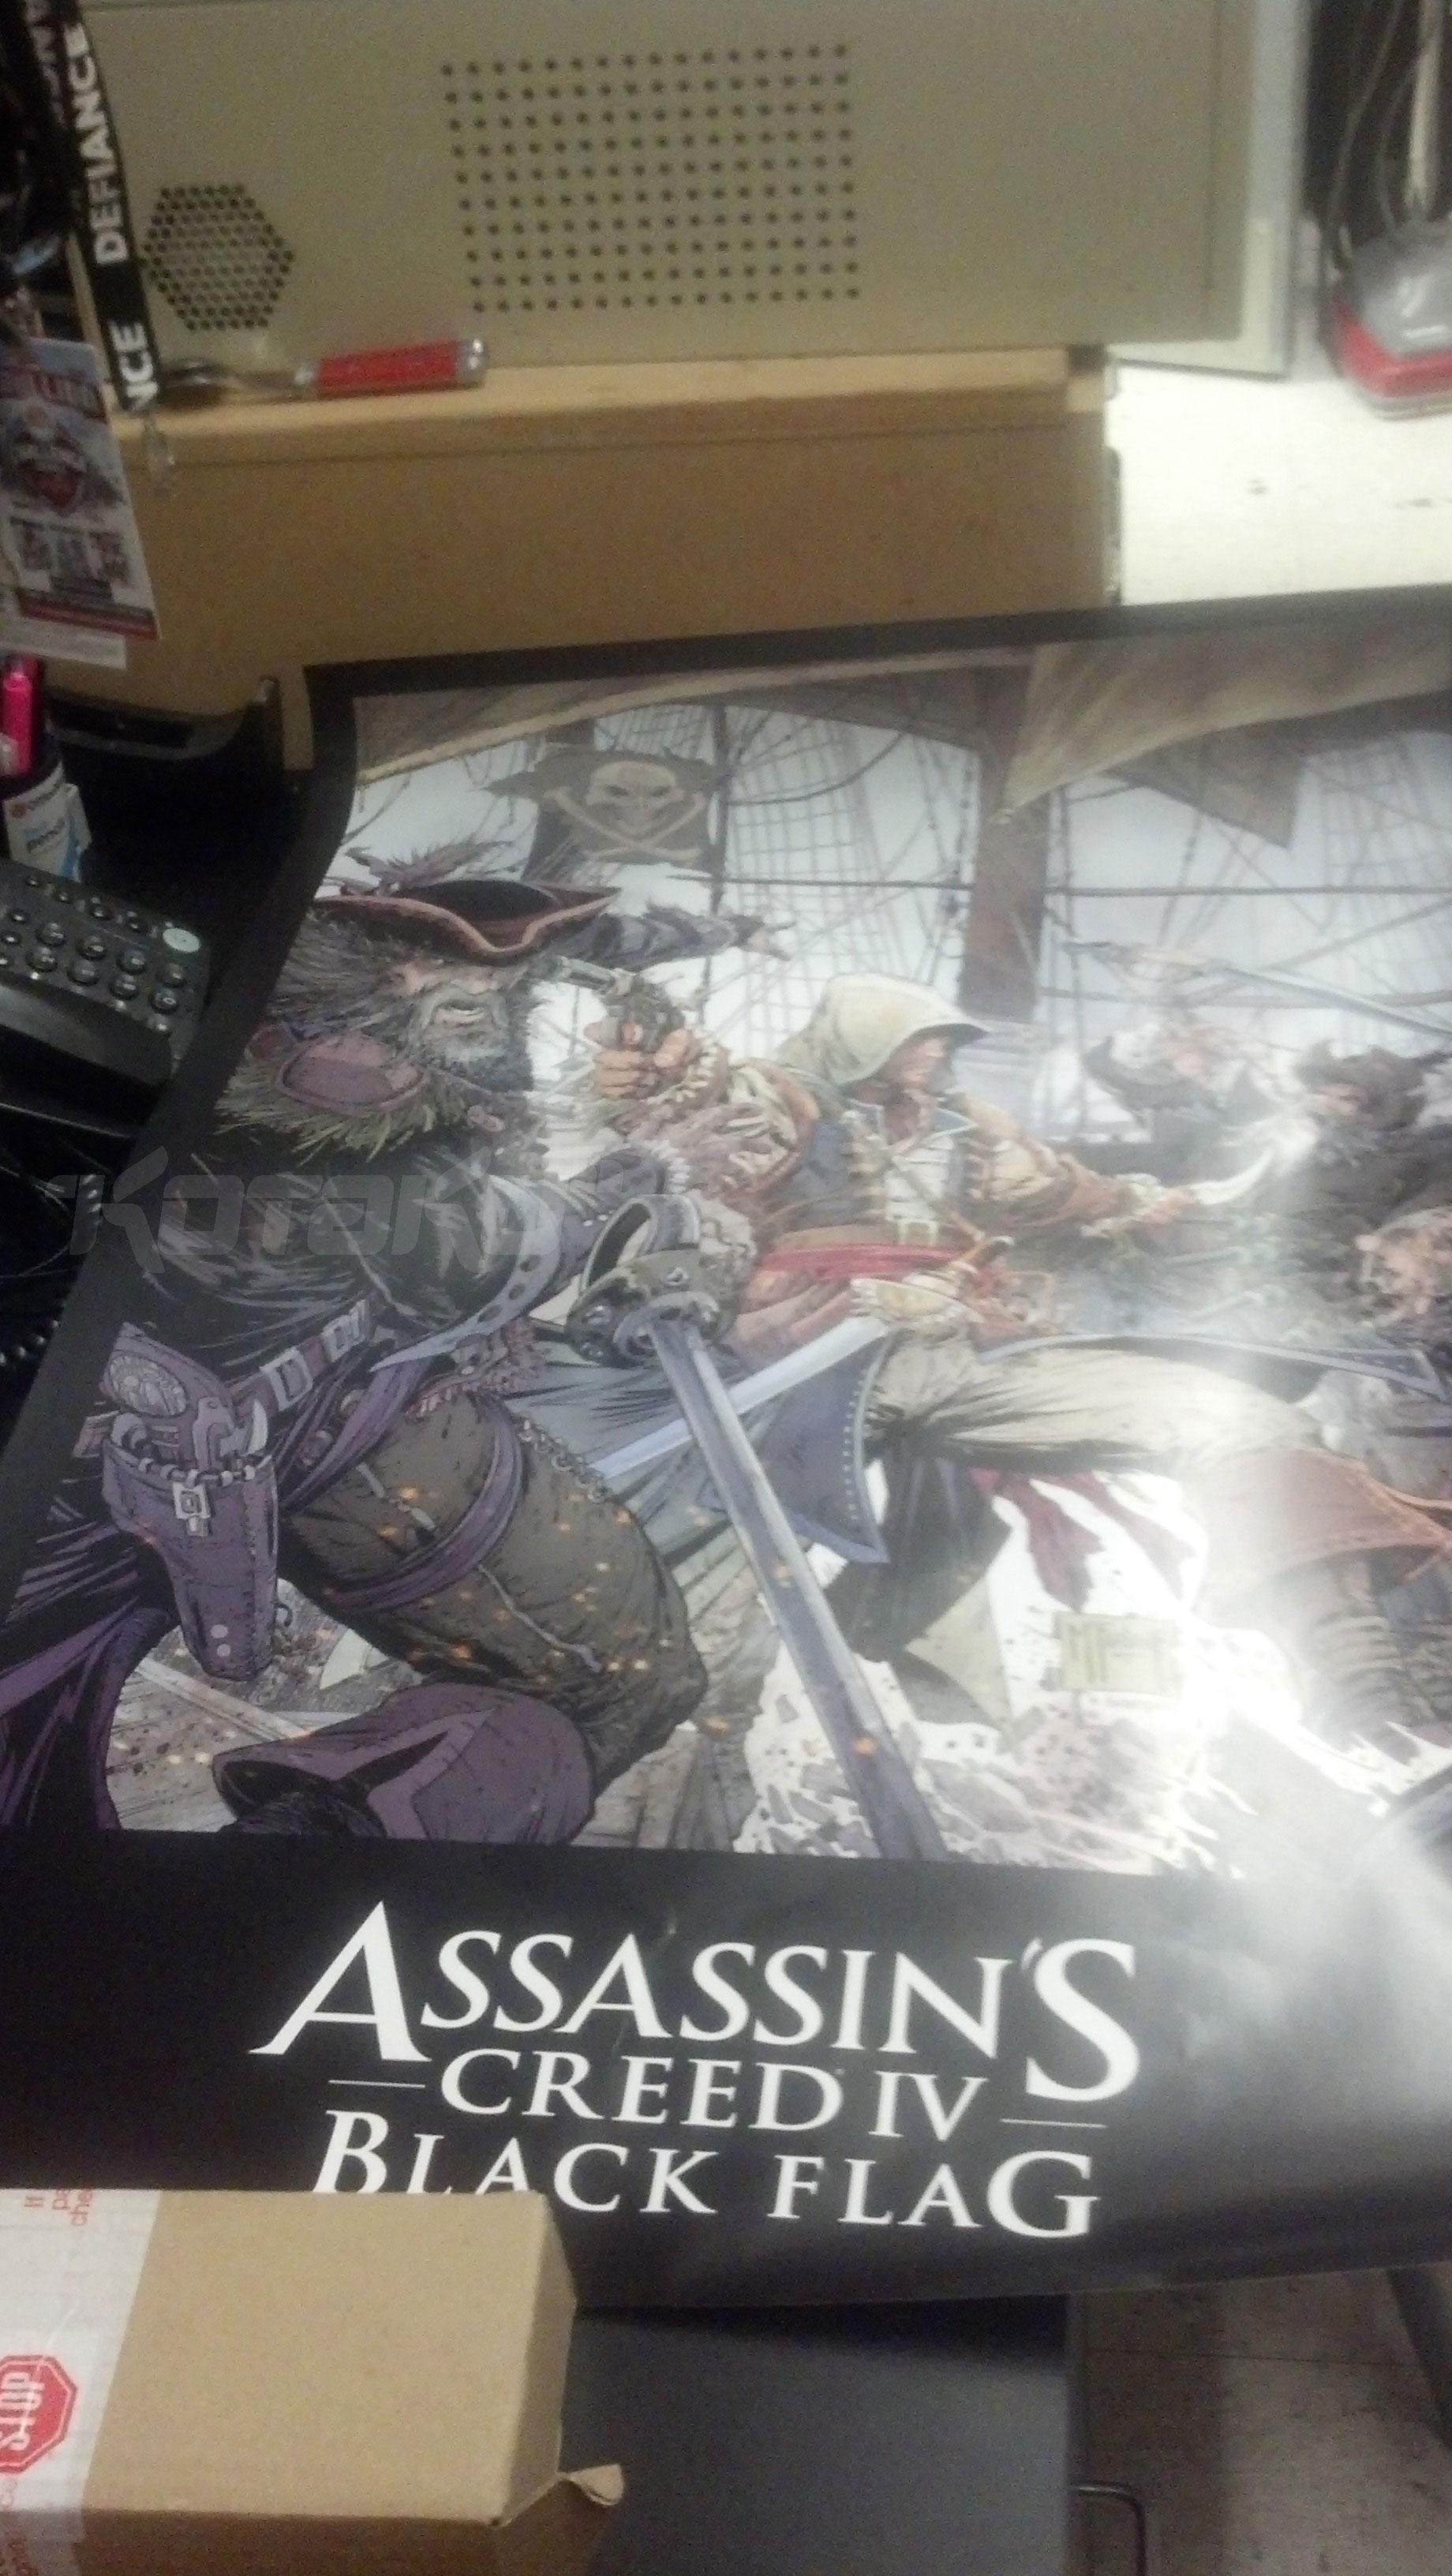 assassins-creed-iv-black-flag-poster